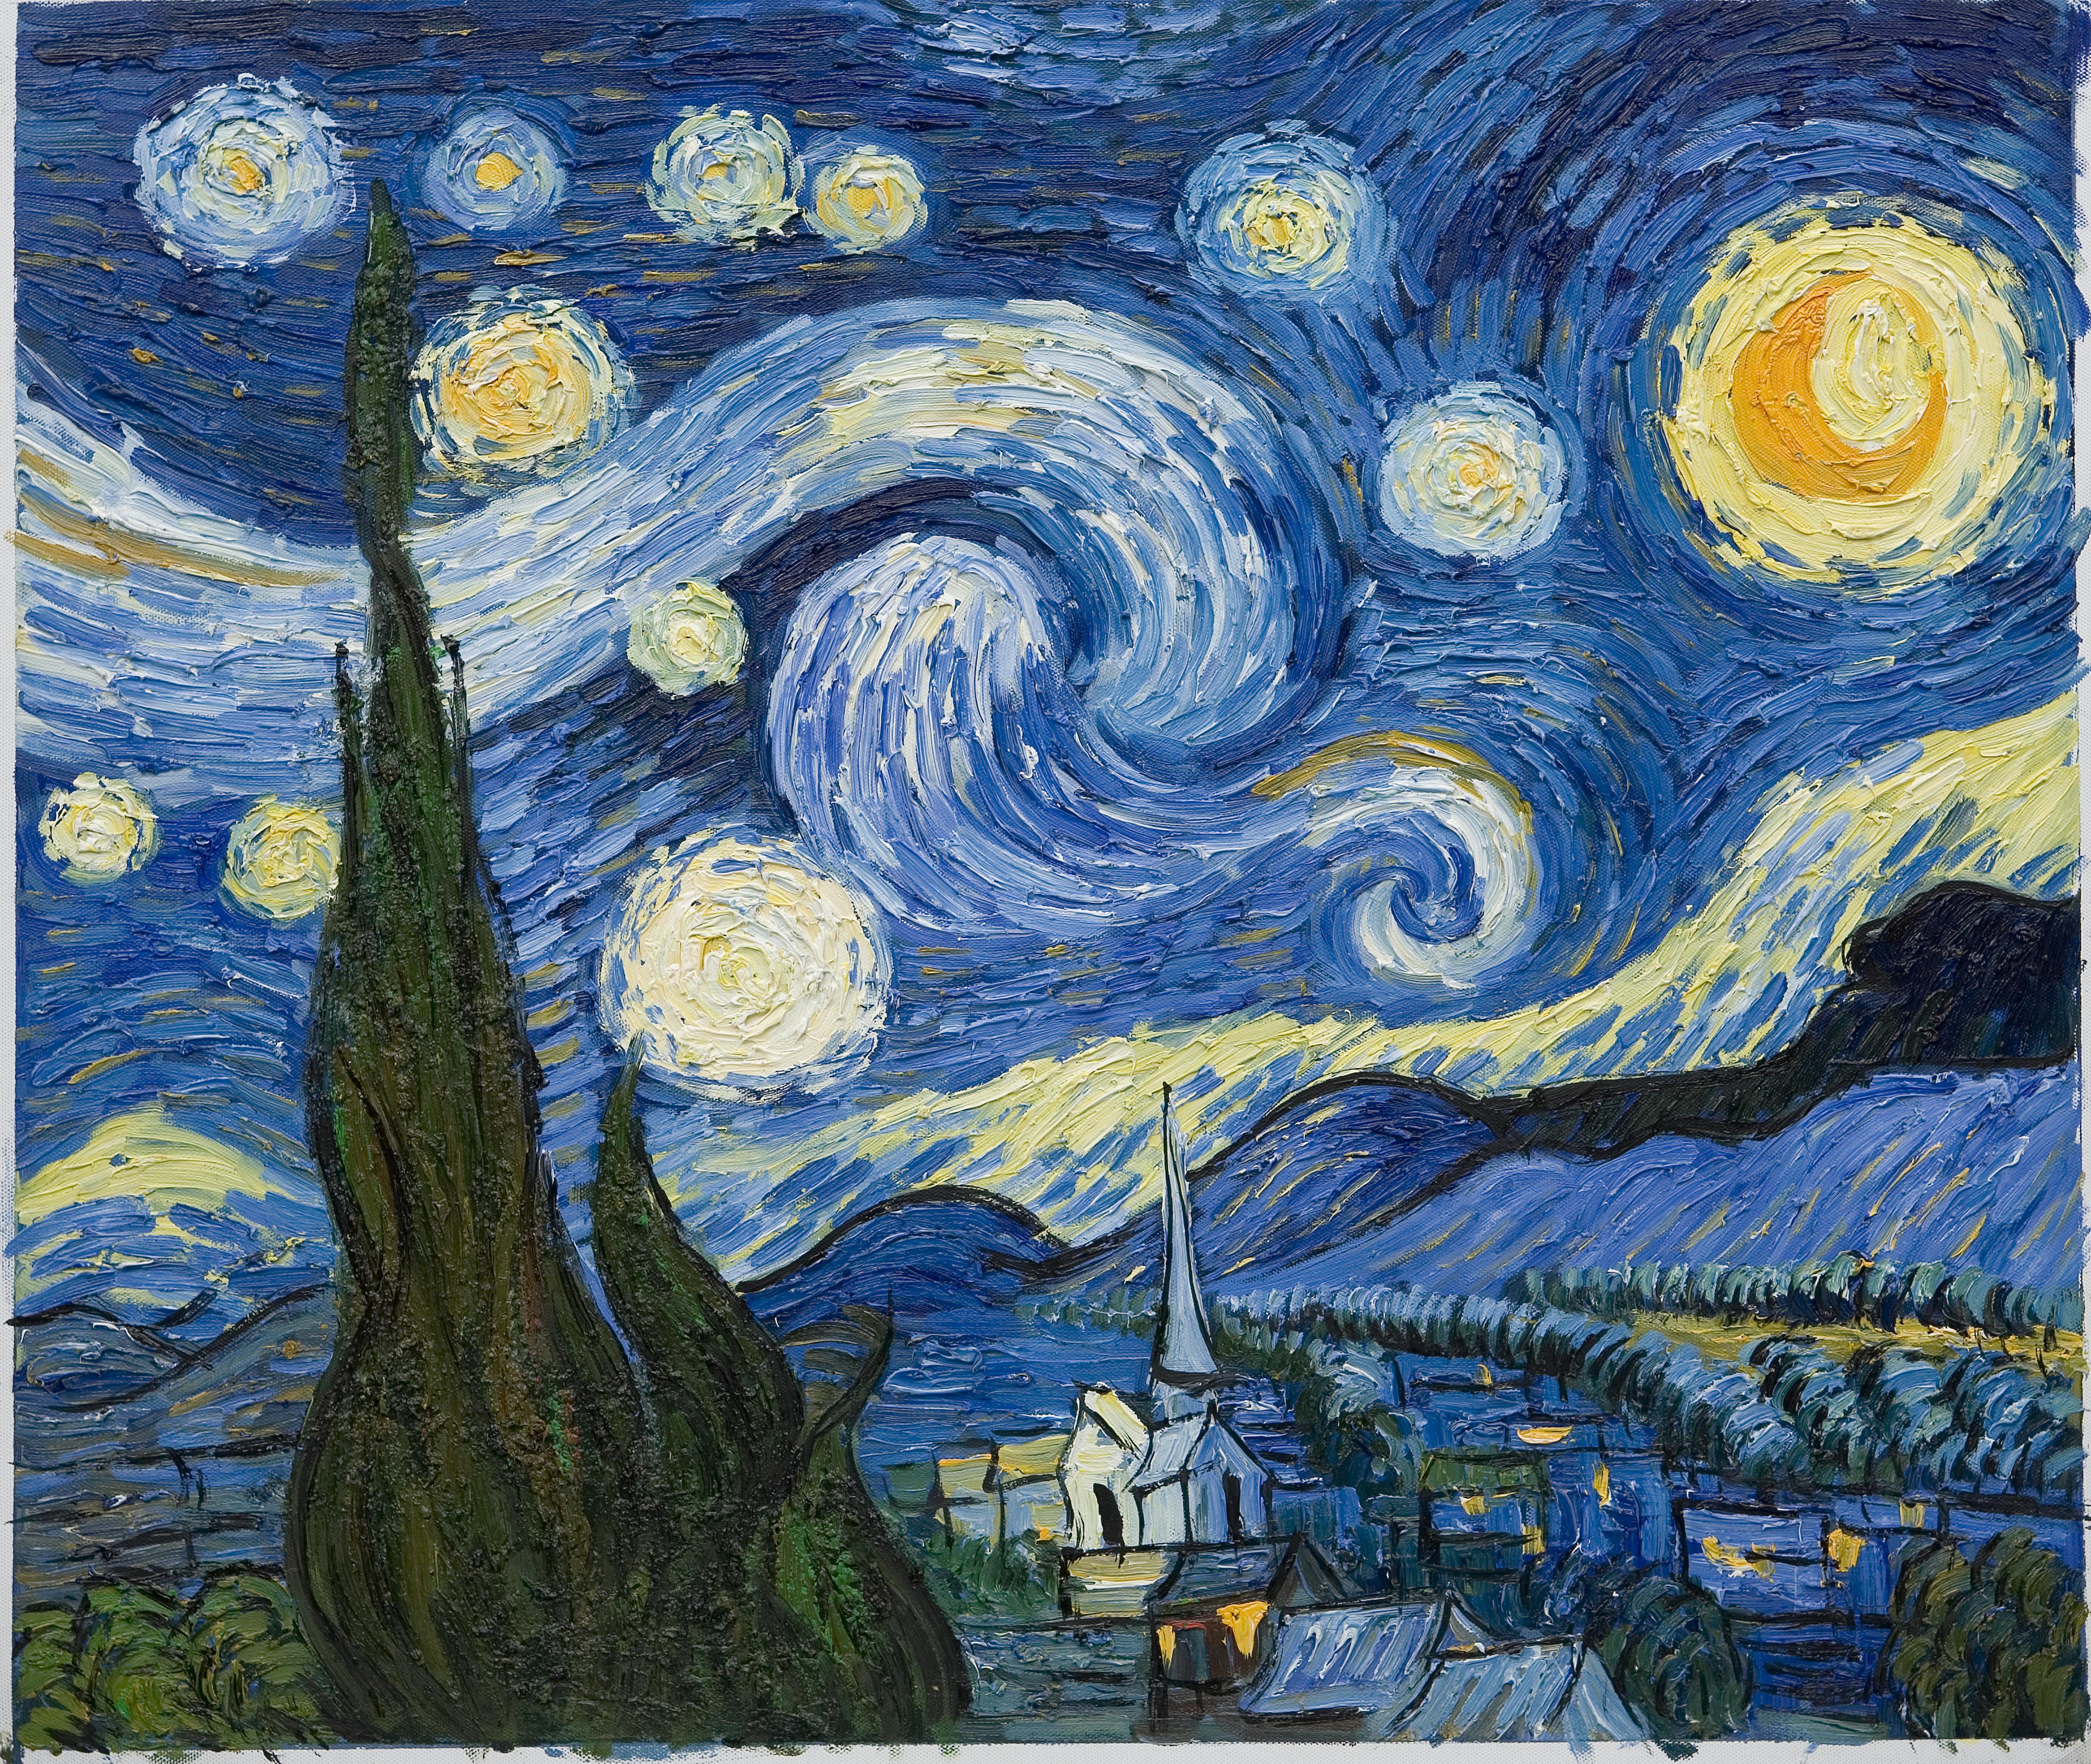 Van Gogh Wallpaper: OverstockArt.com Named To The Inc. 500